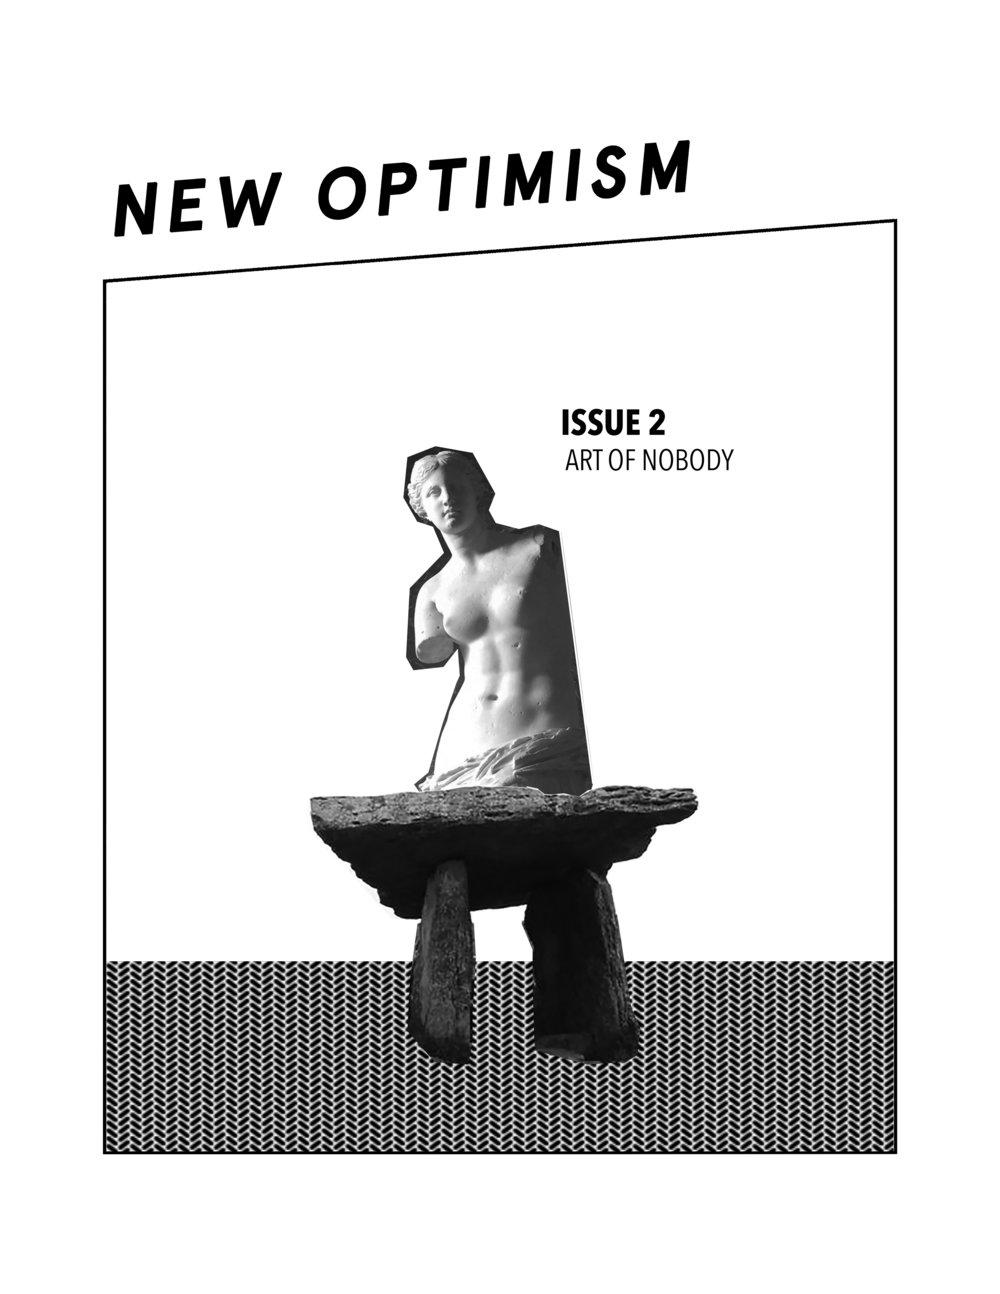 NEW OPTIMISM SWEATSHIRTS DESIGN